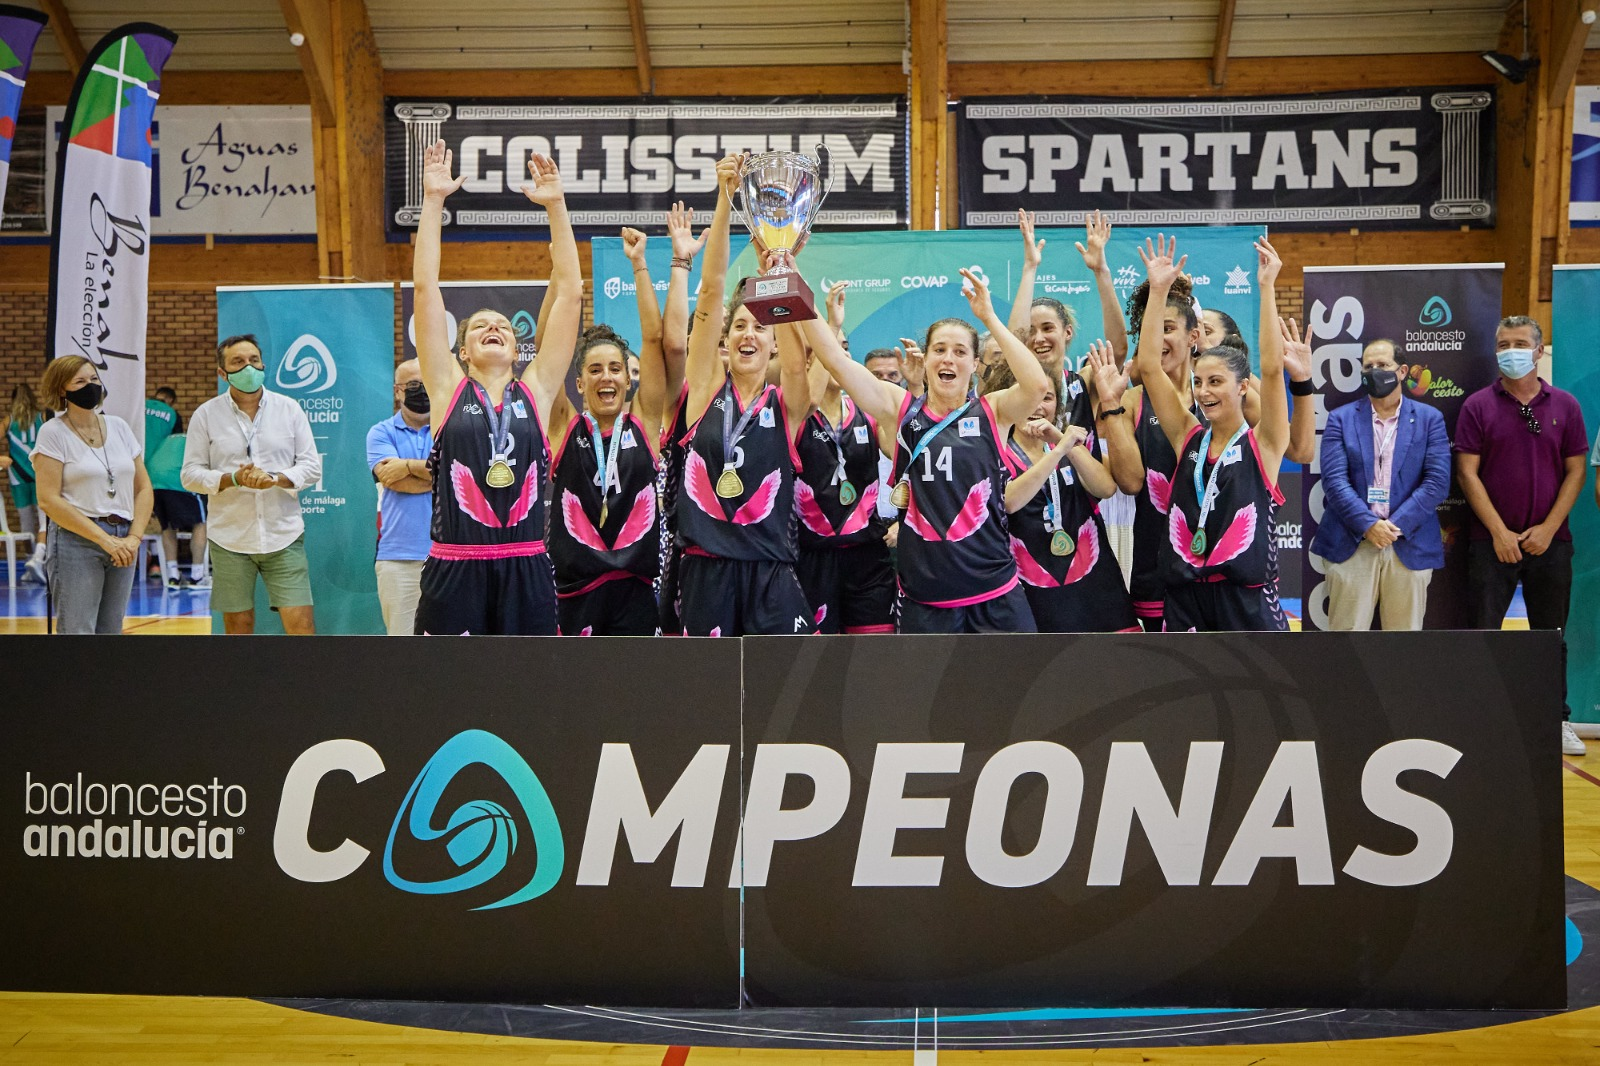 raca-campeonas-andalucia